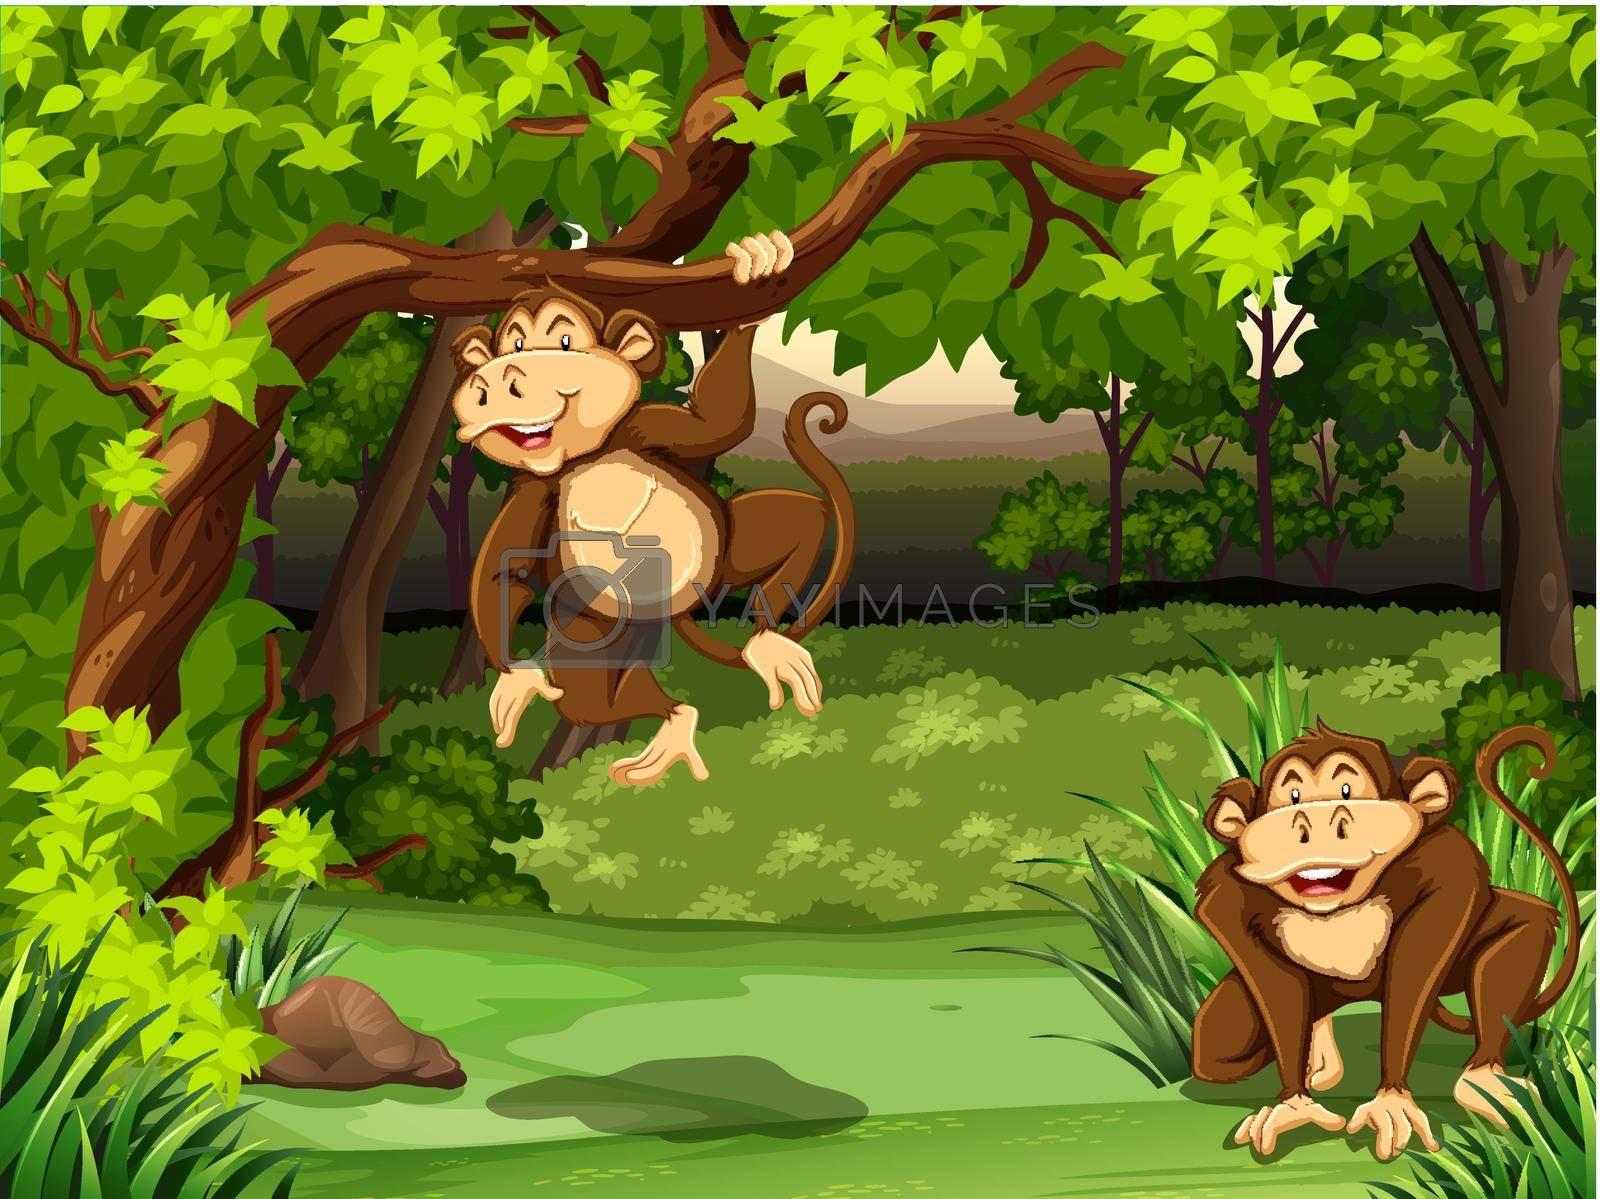 Royalty free image of Monkeys by iimages